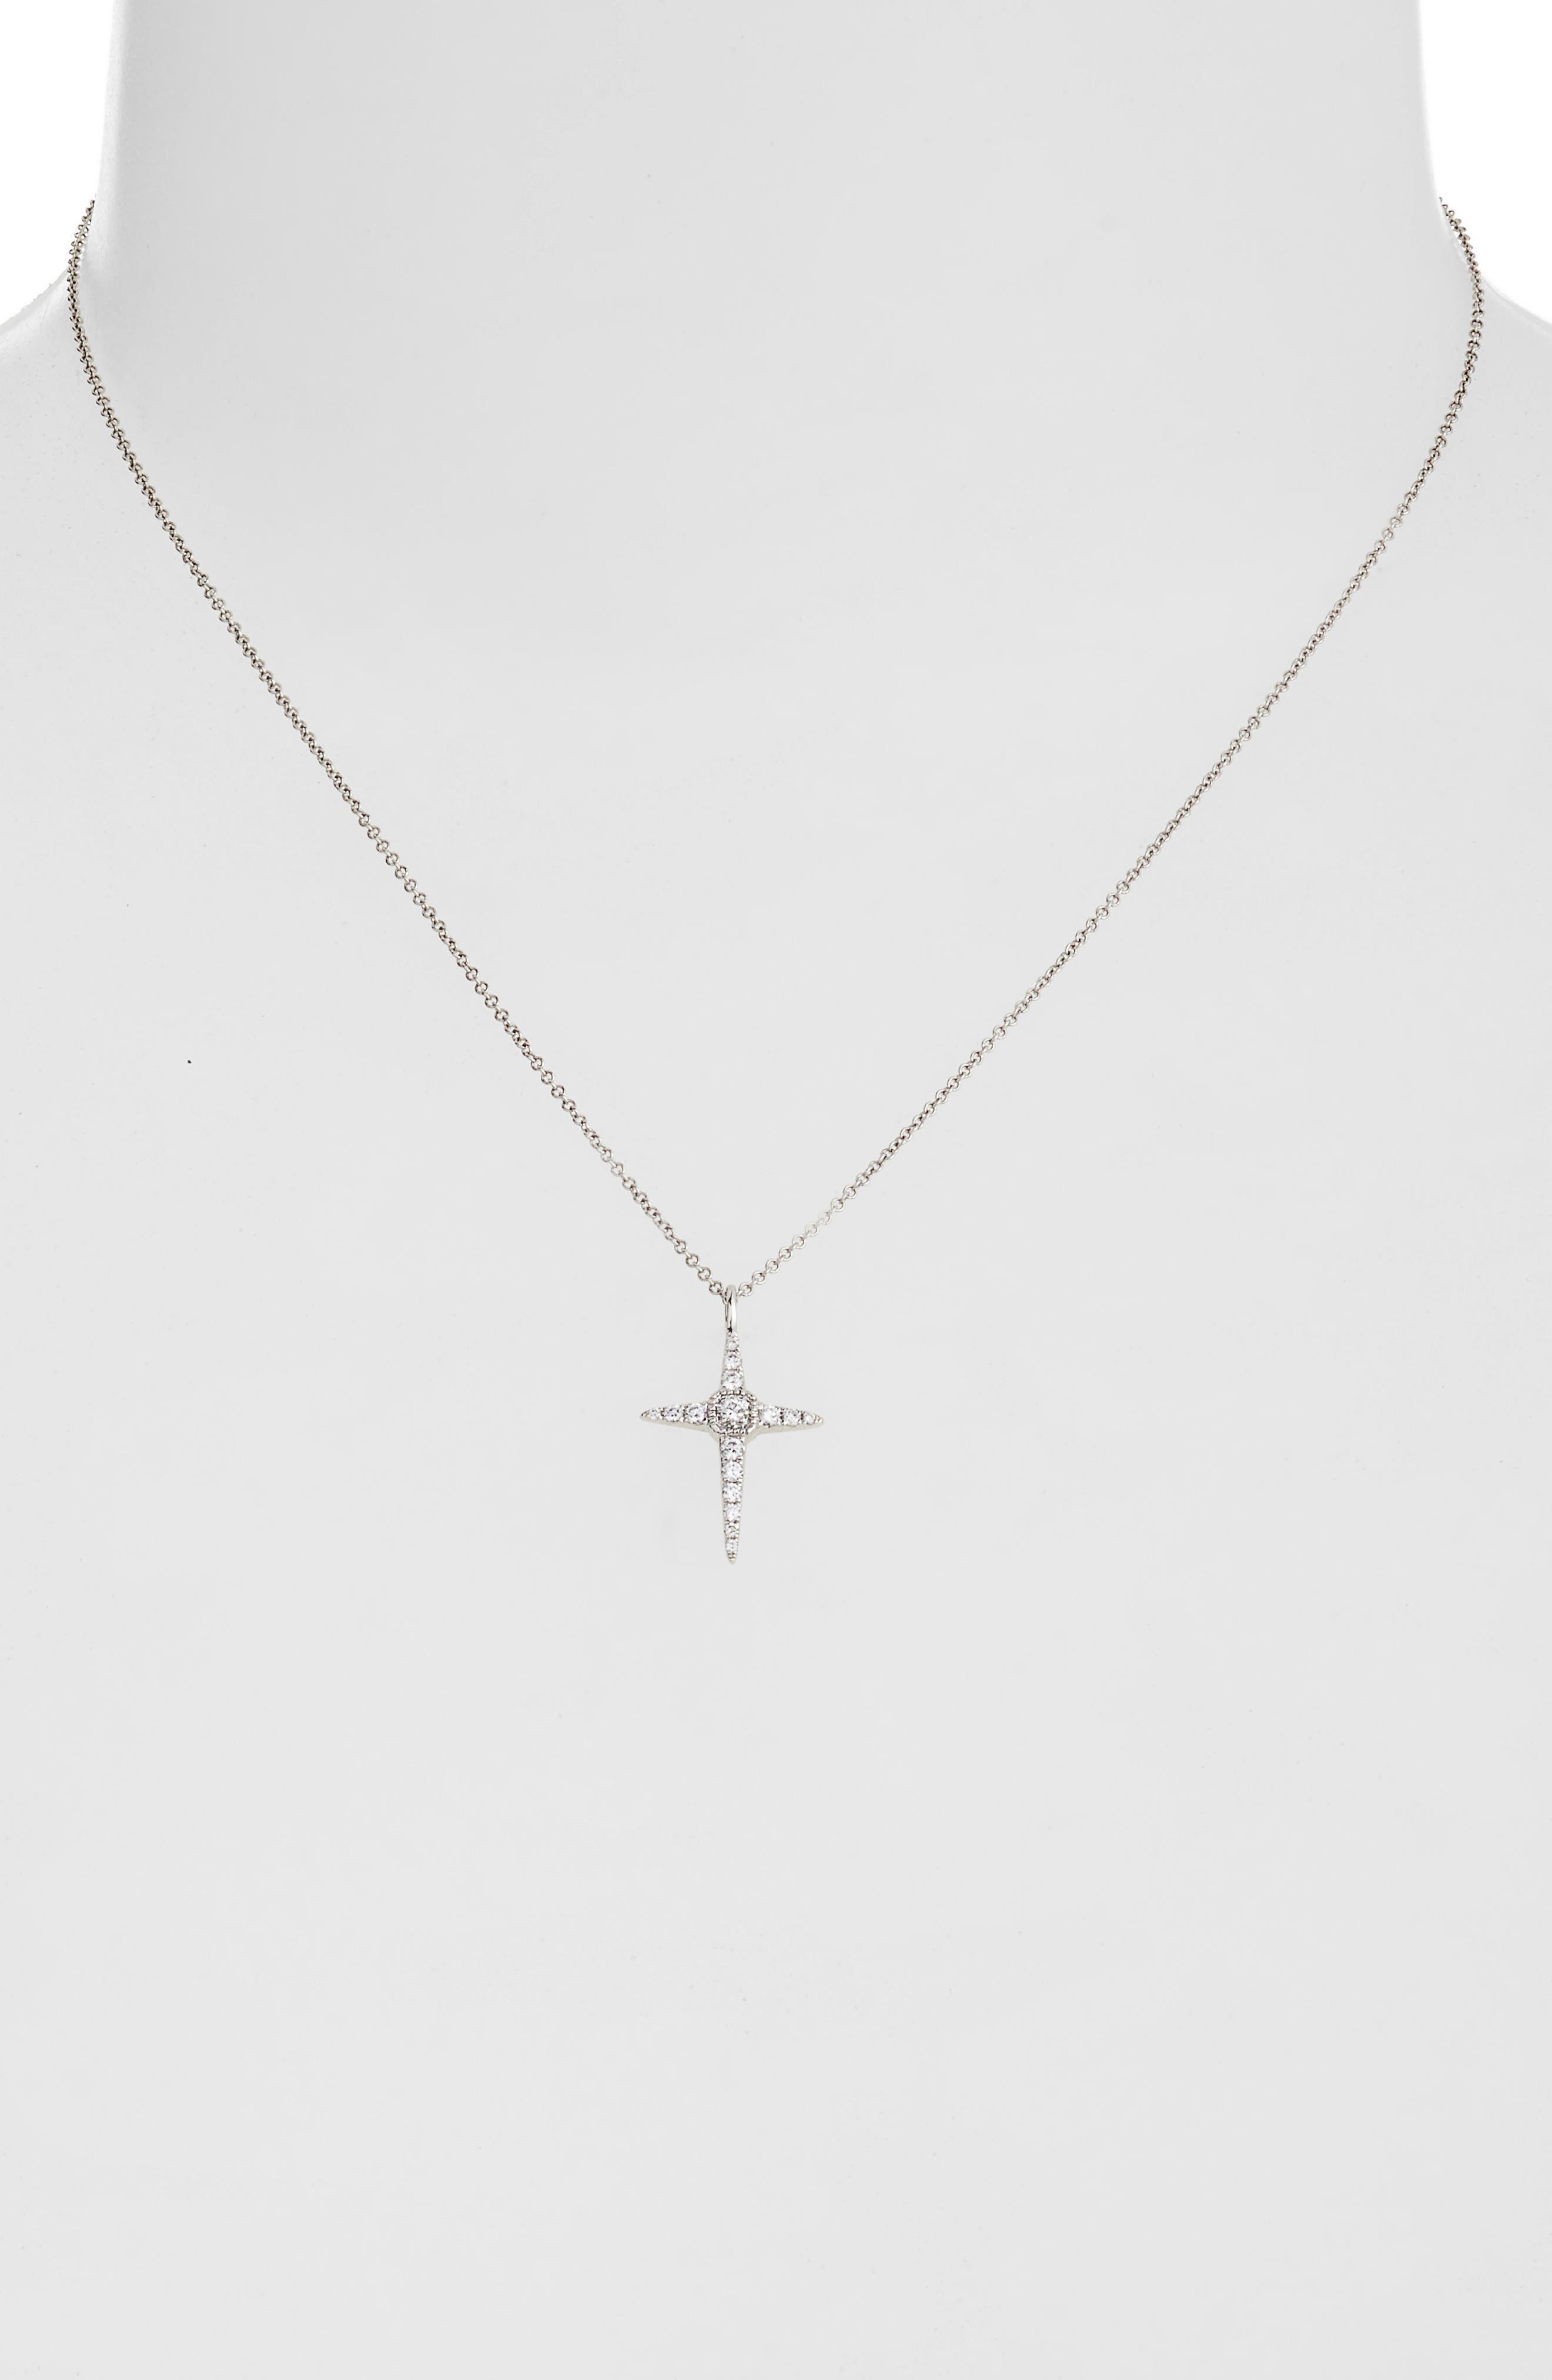 Diamond Cross Pendant Necklace,                             Alternate thumbnail 2, color,                             WHITE GOLD/ DIAMOND